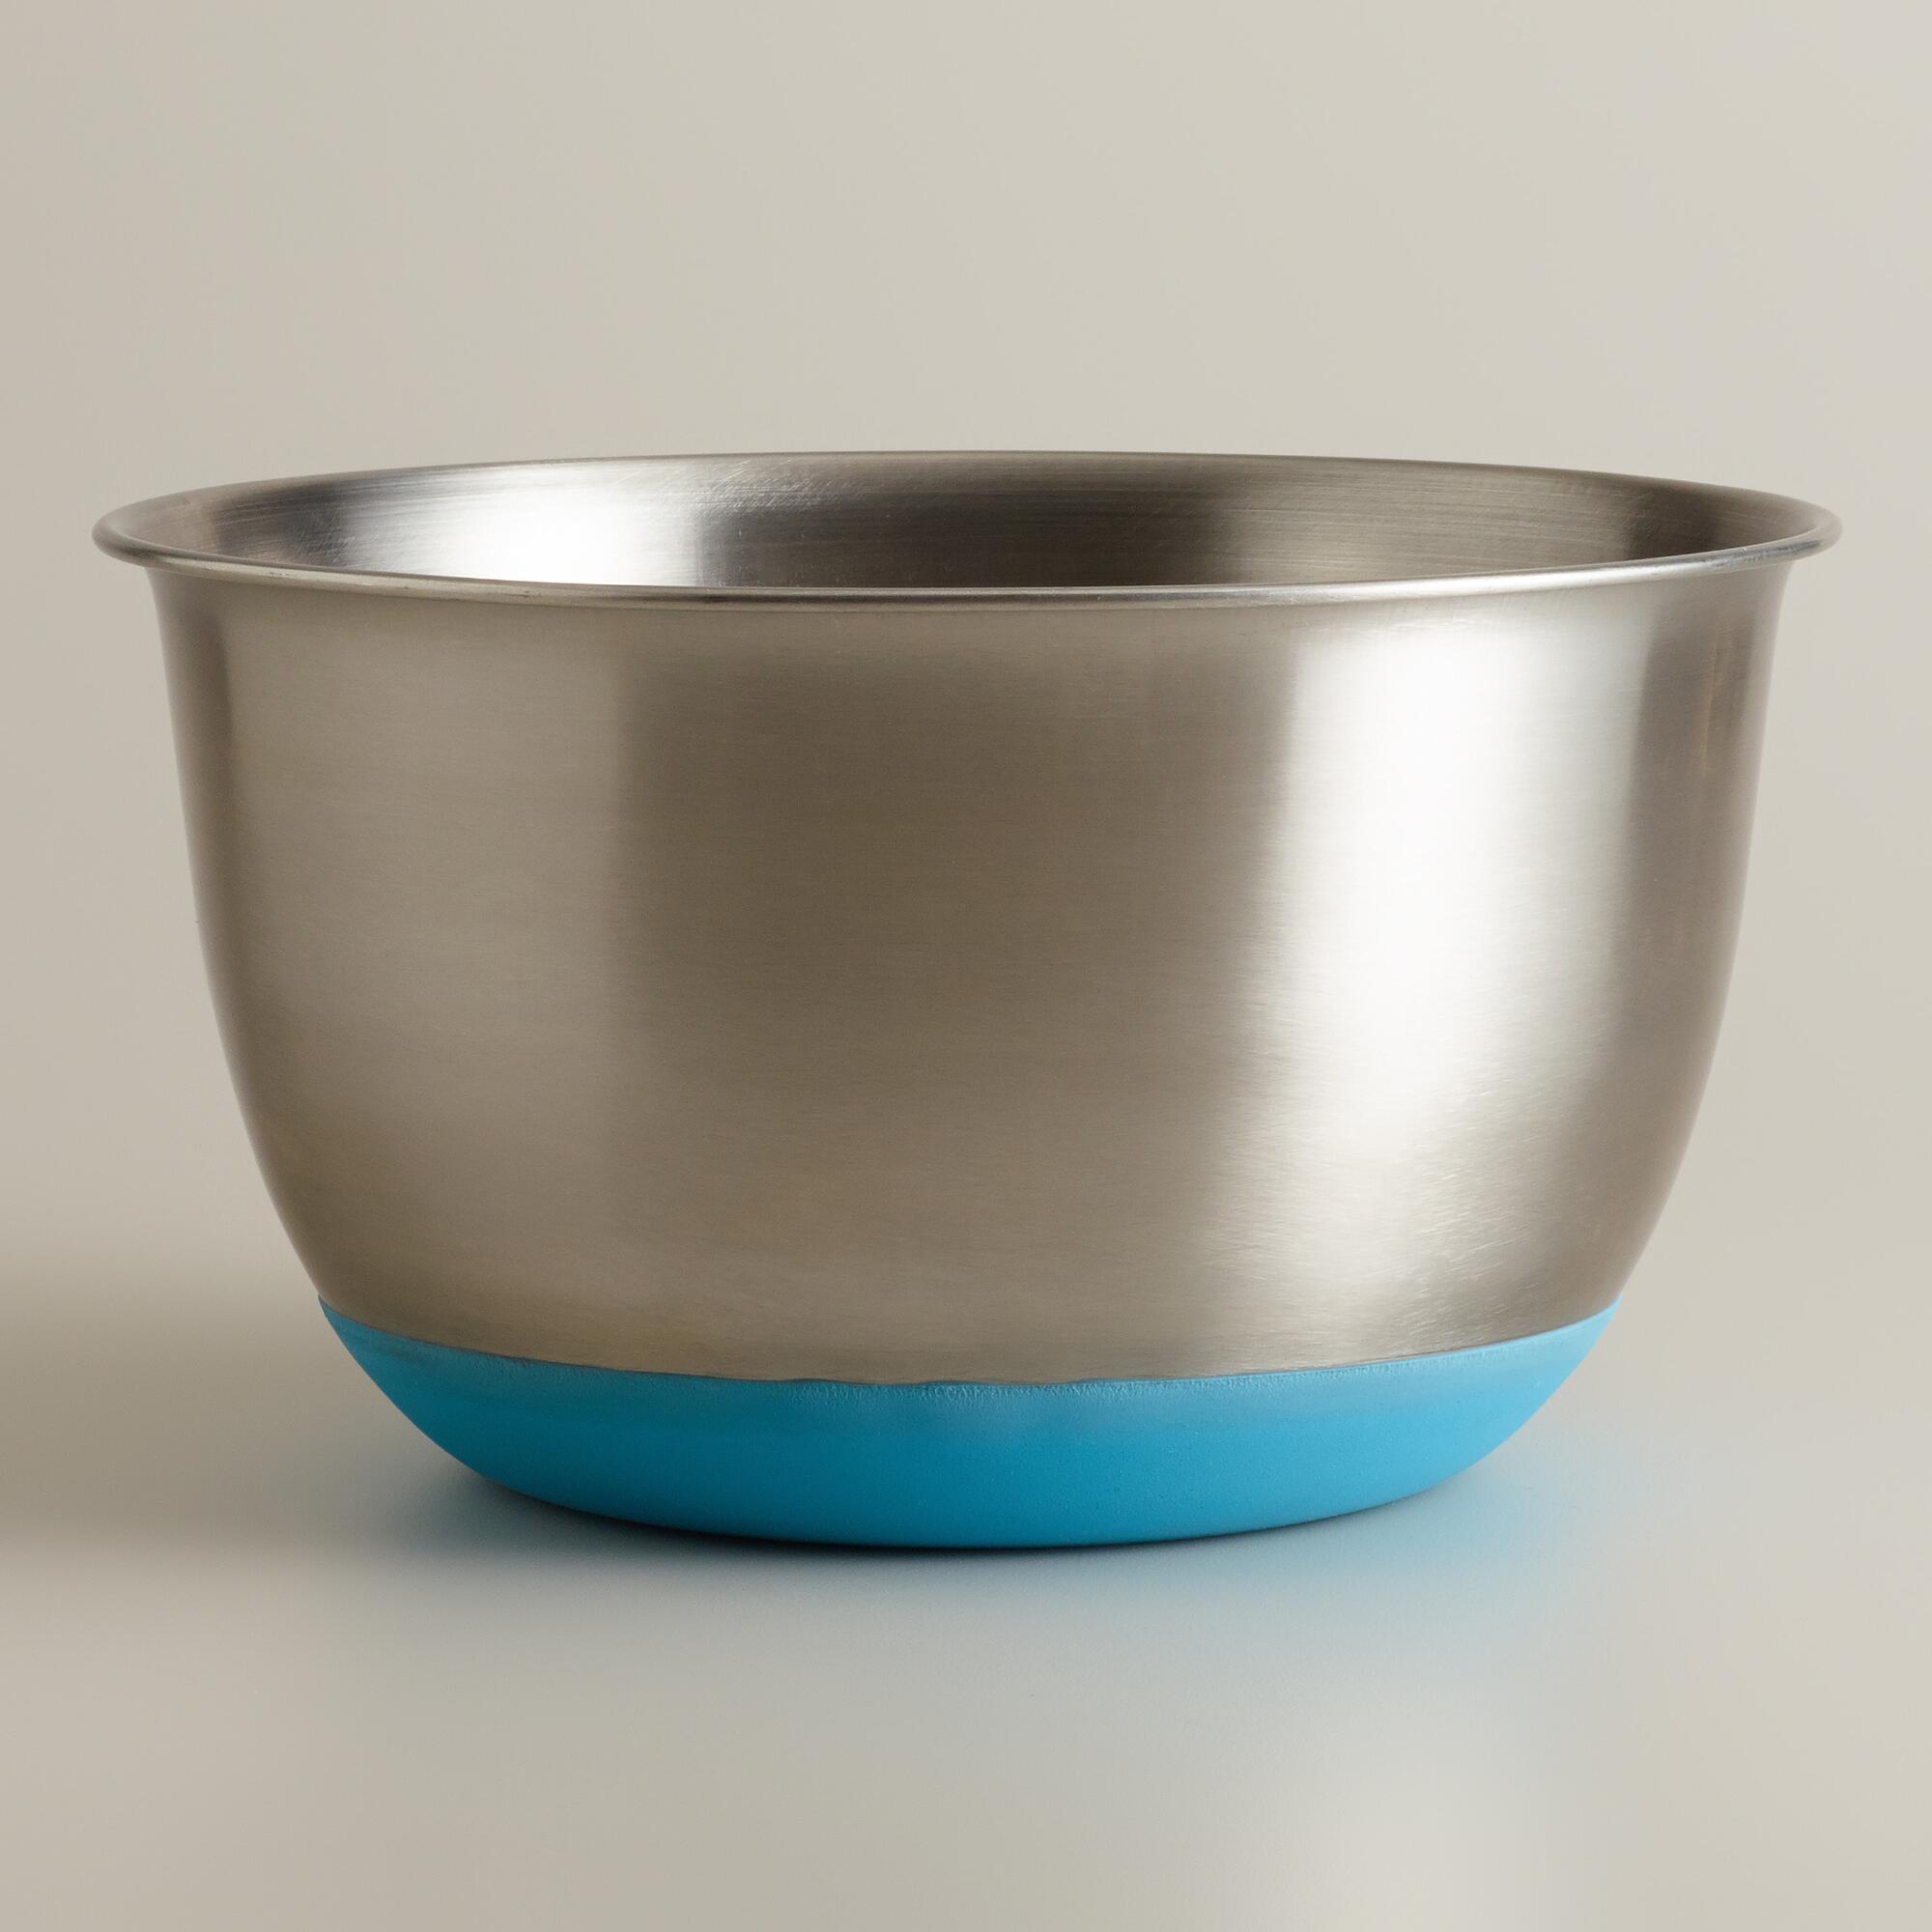 Aqua 5-Quart Stainless Steel Mixing Bowl | World Market